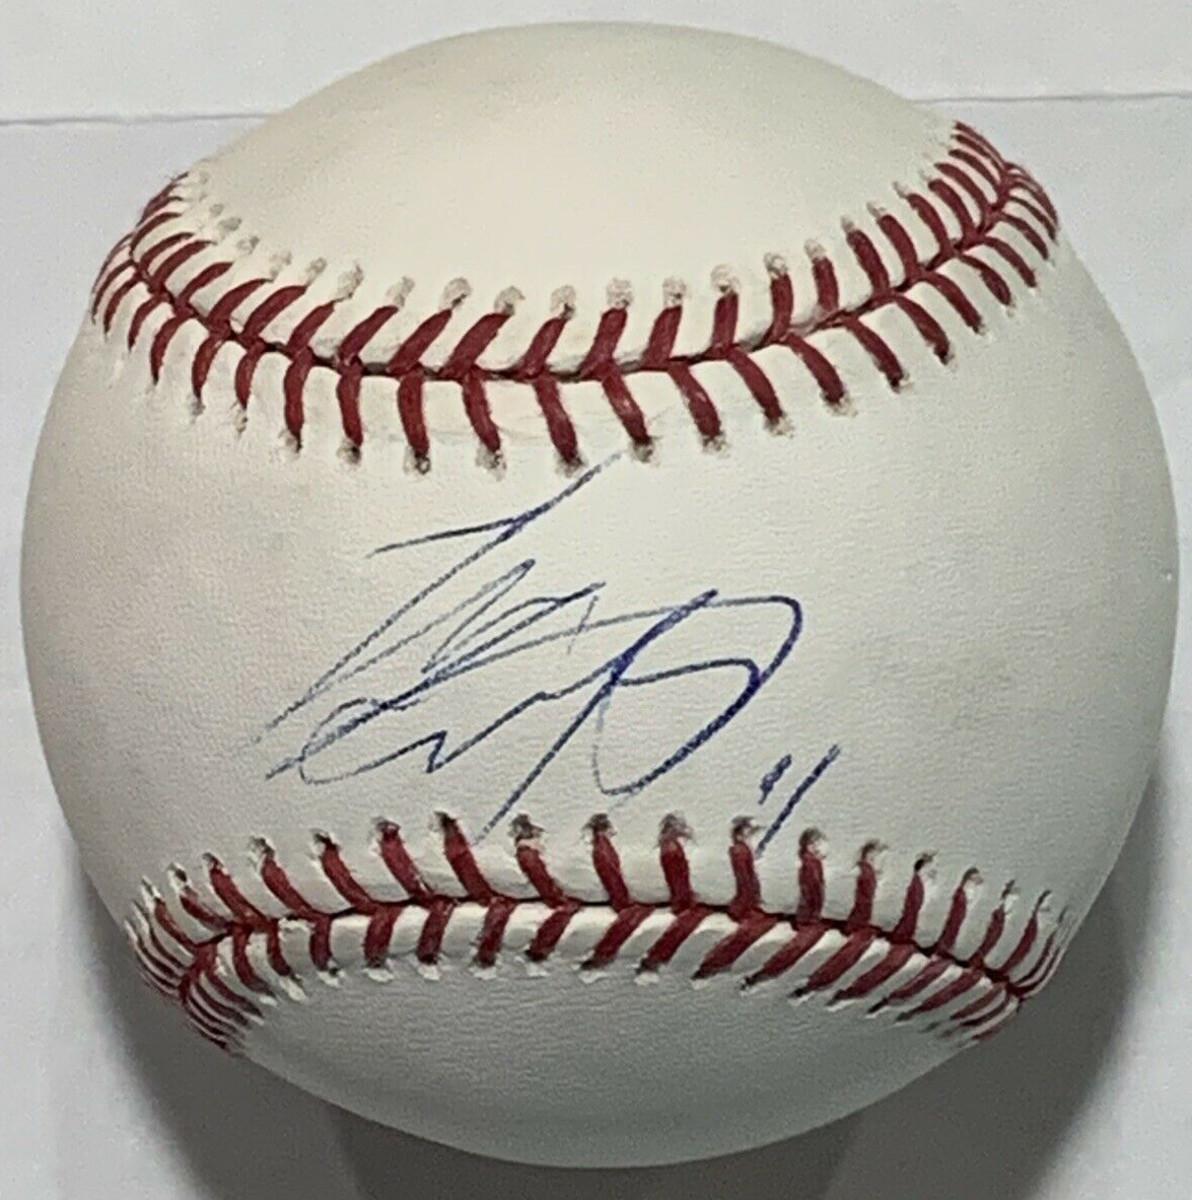 A Shohei Ohtani-signed baseball.